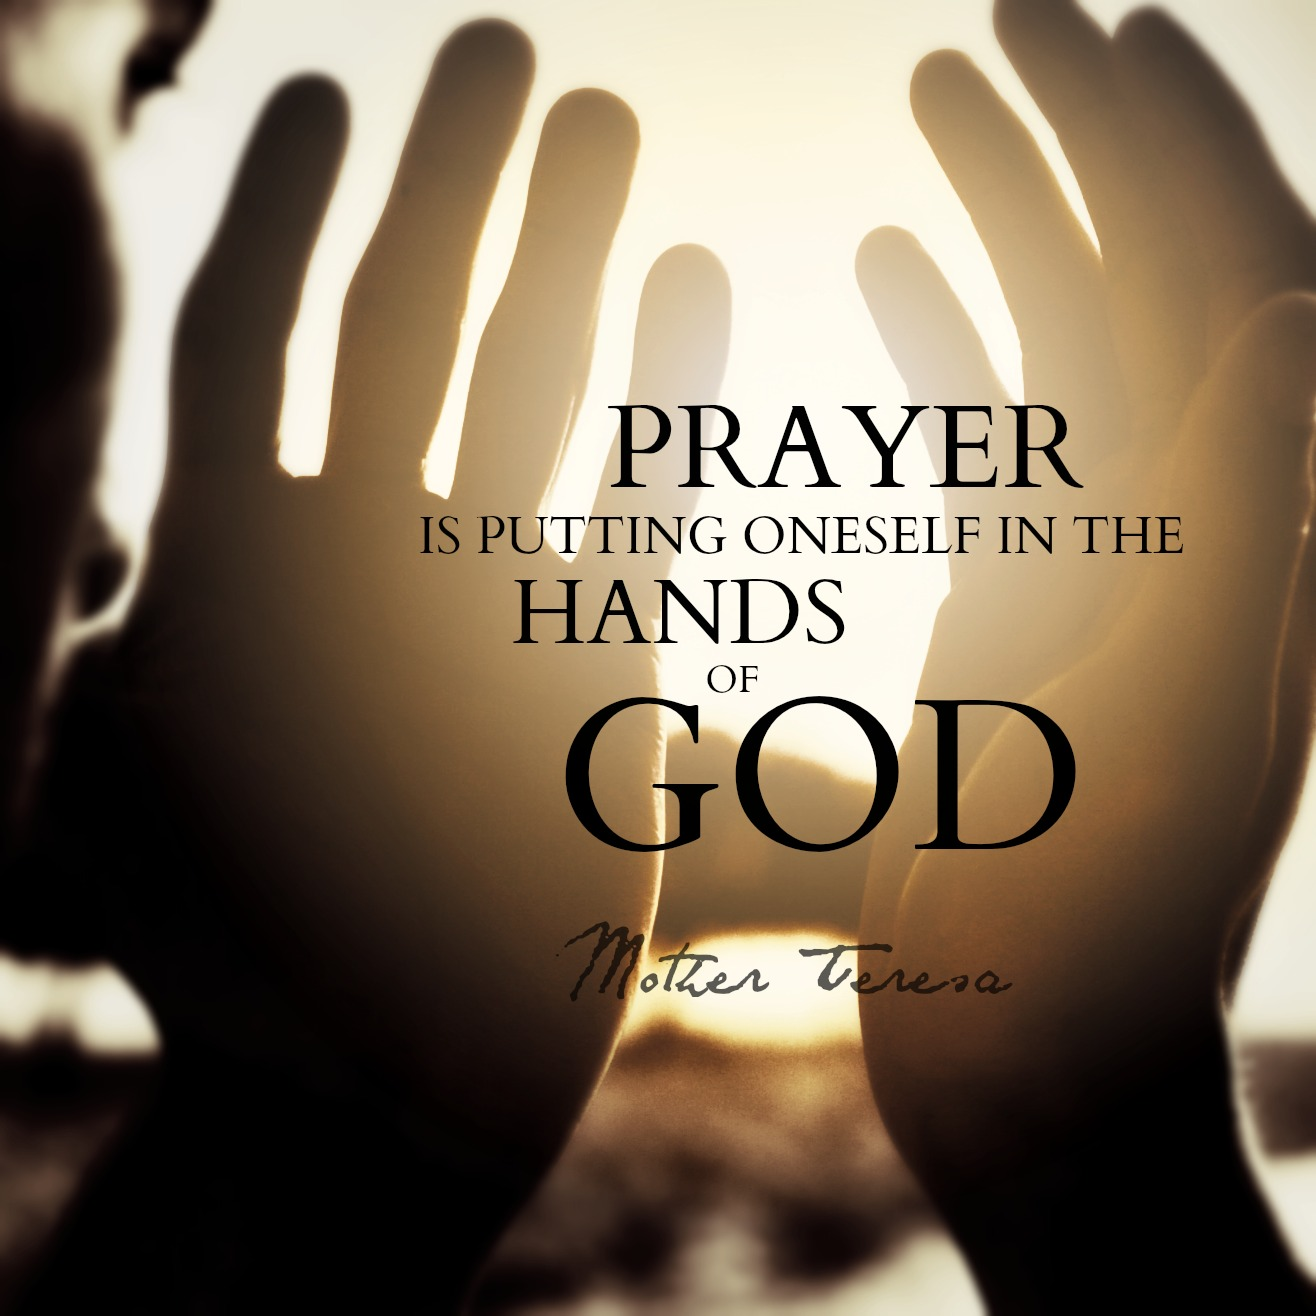 prayer%20request%20image